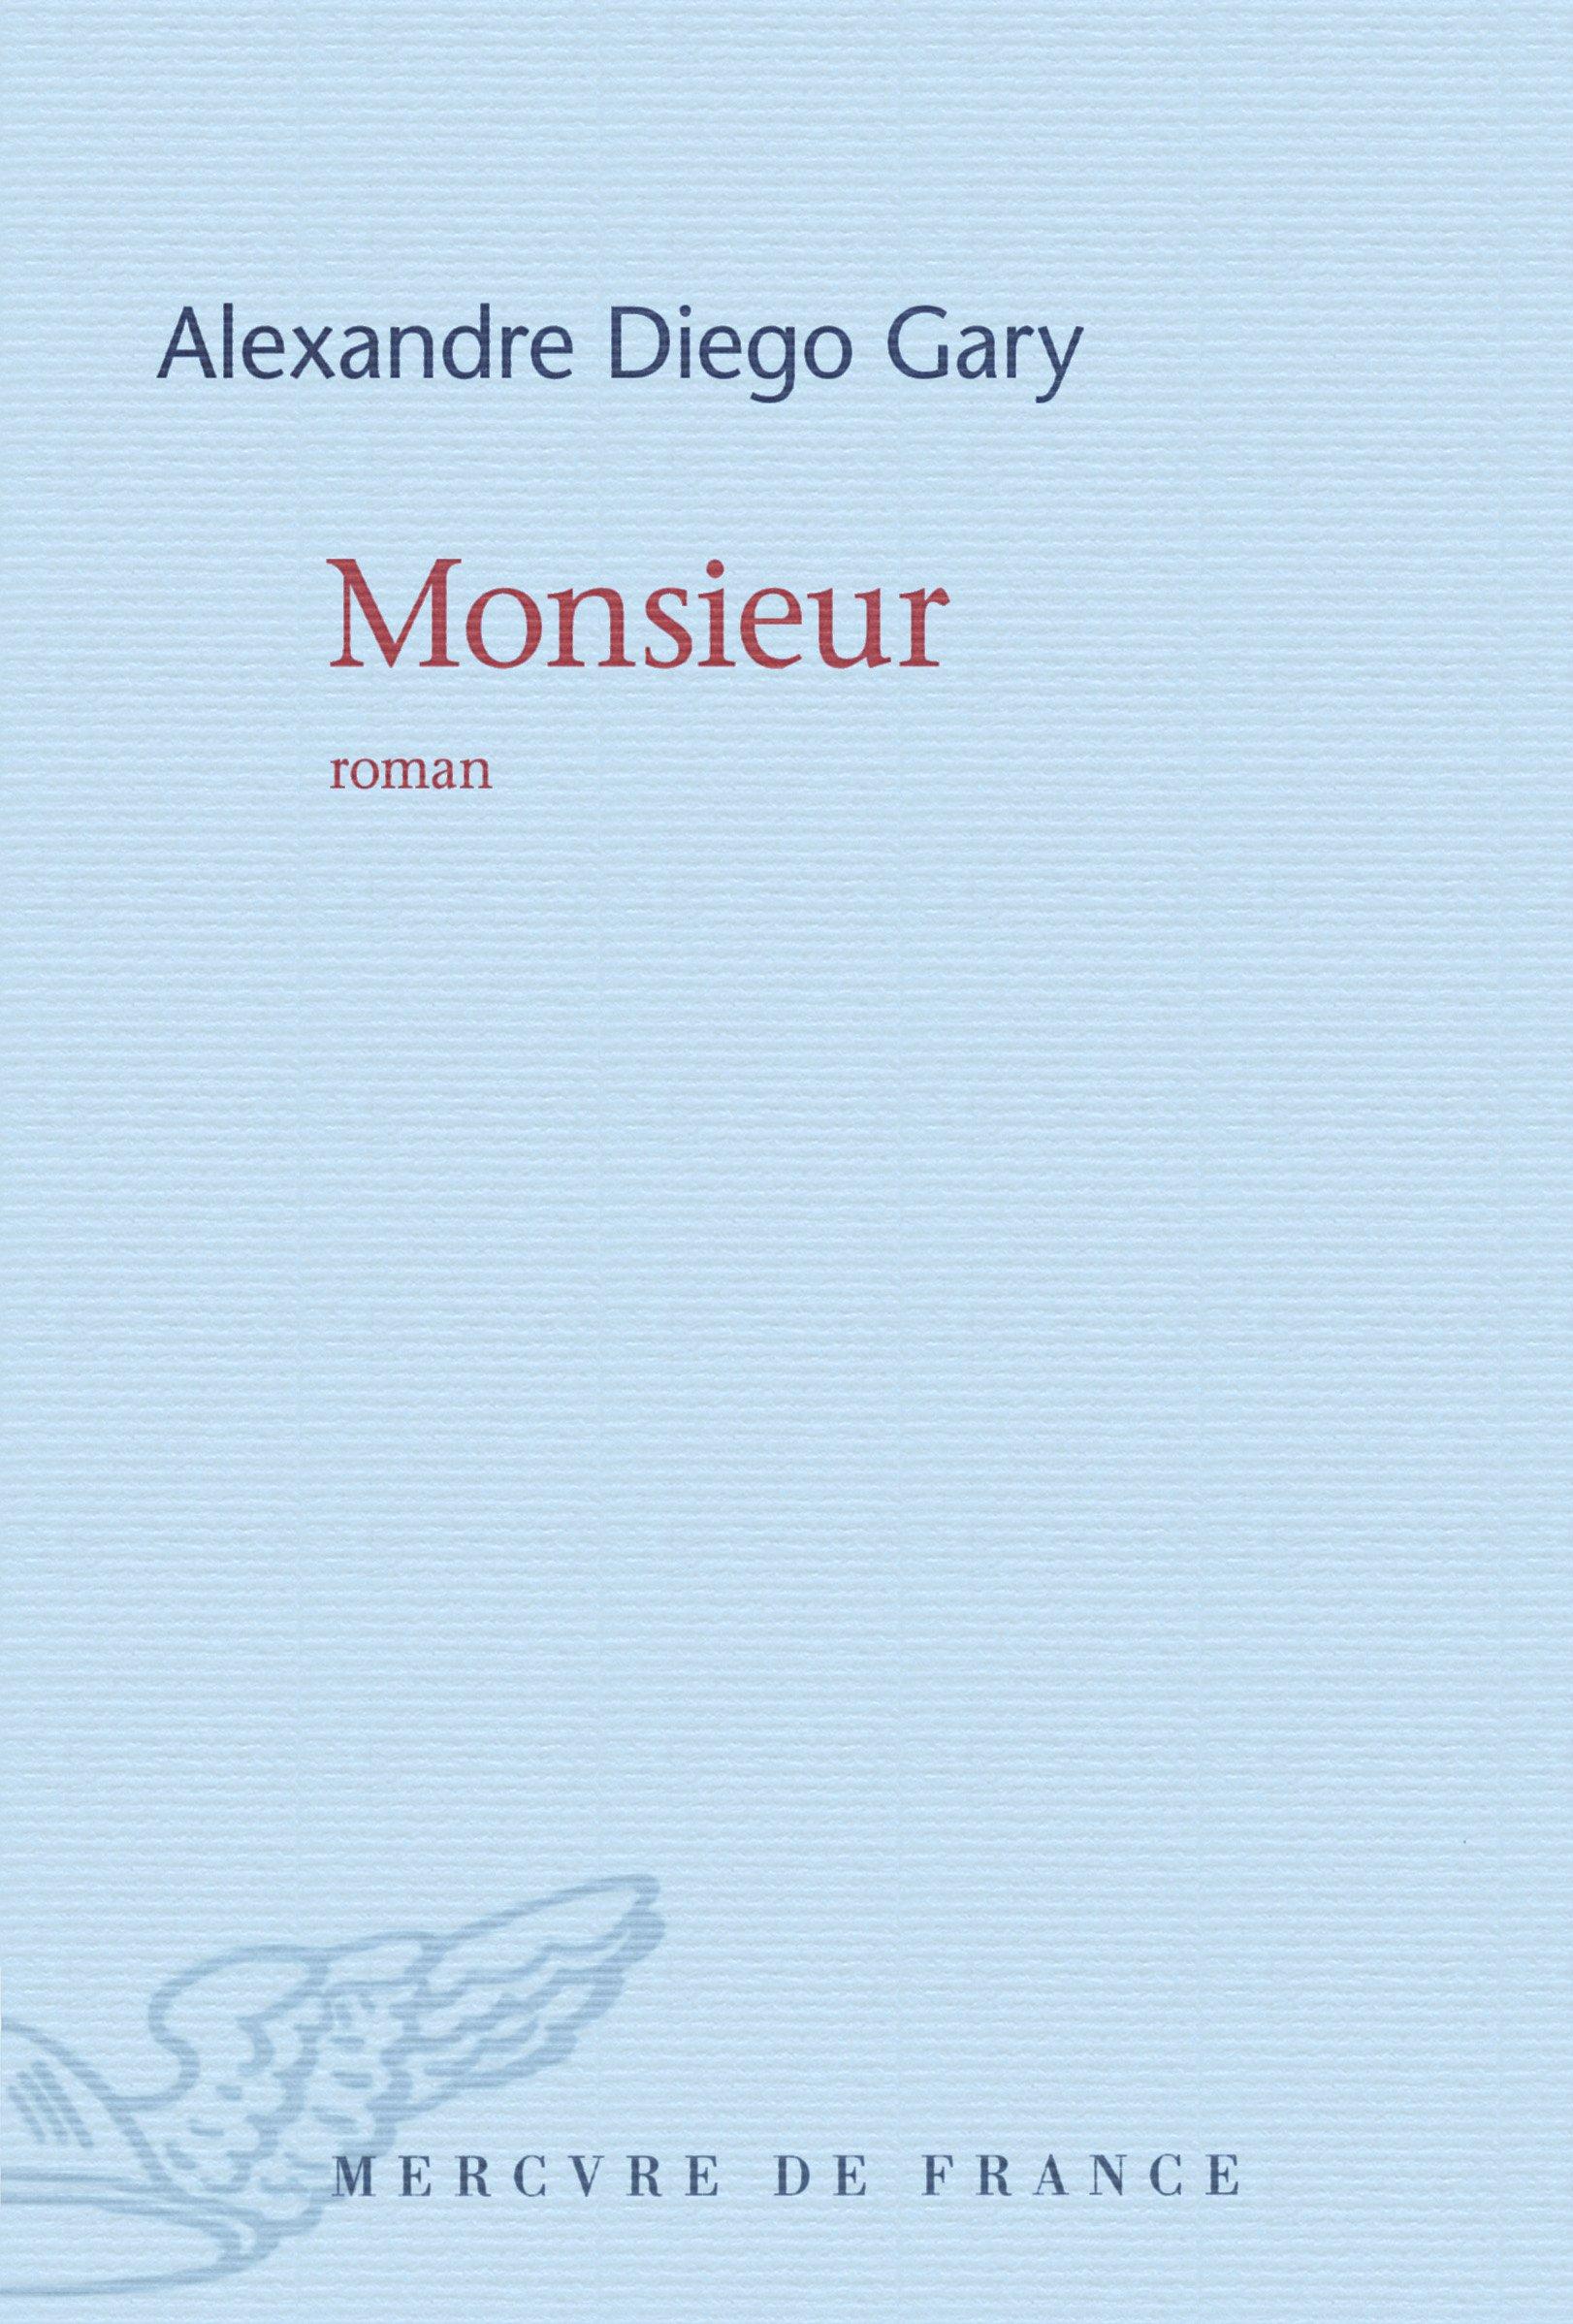 Download monsieur pdf epub